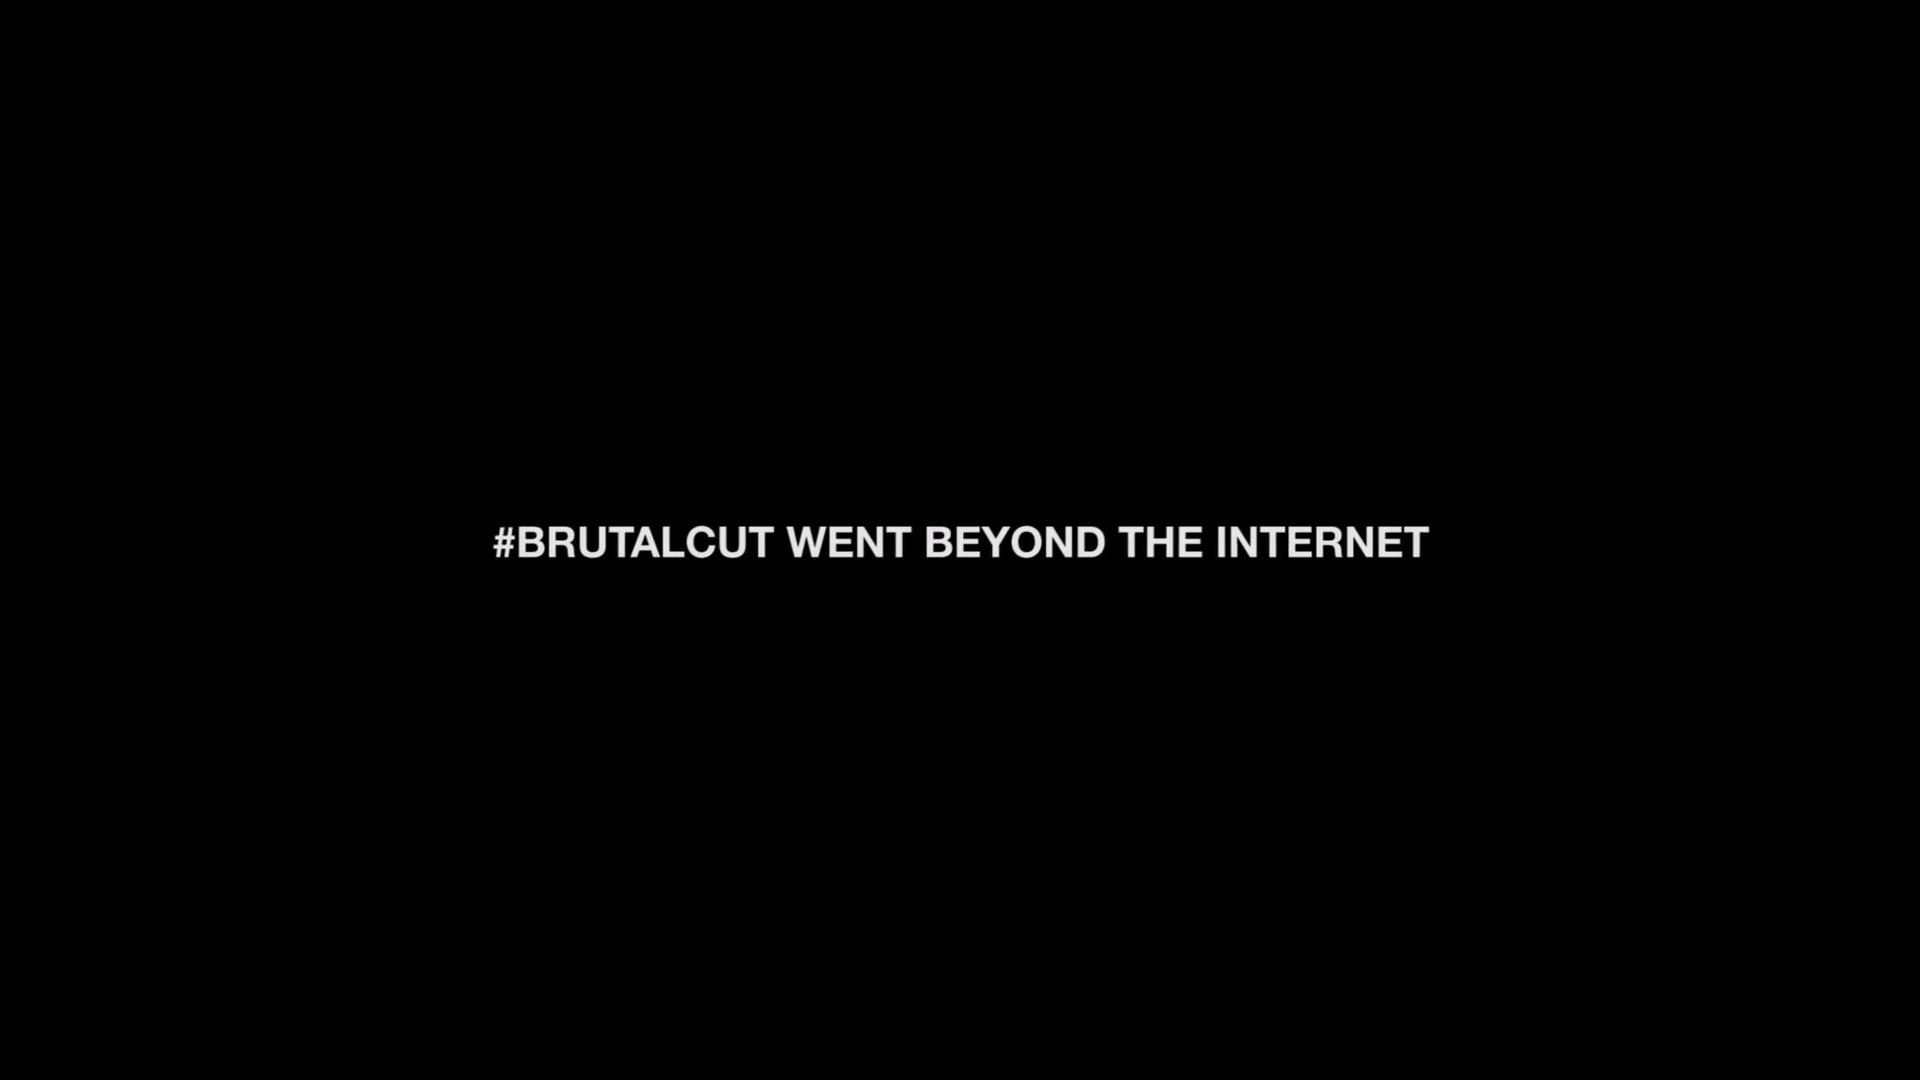 Thumbnail for Brutal Cut